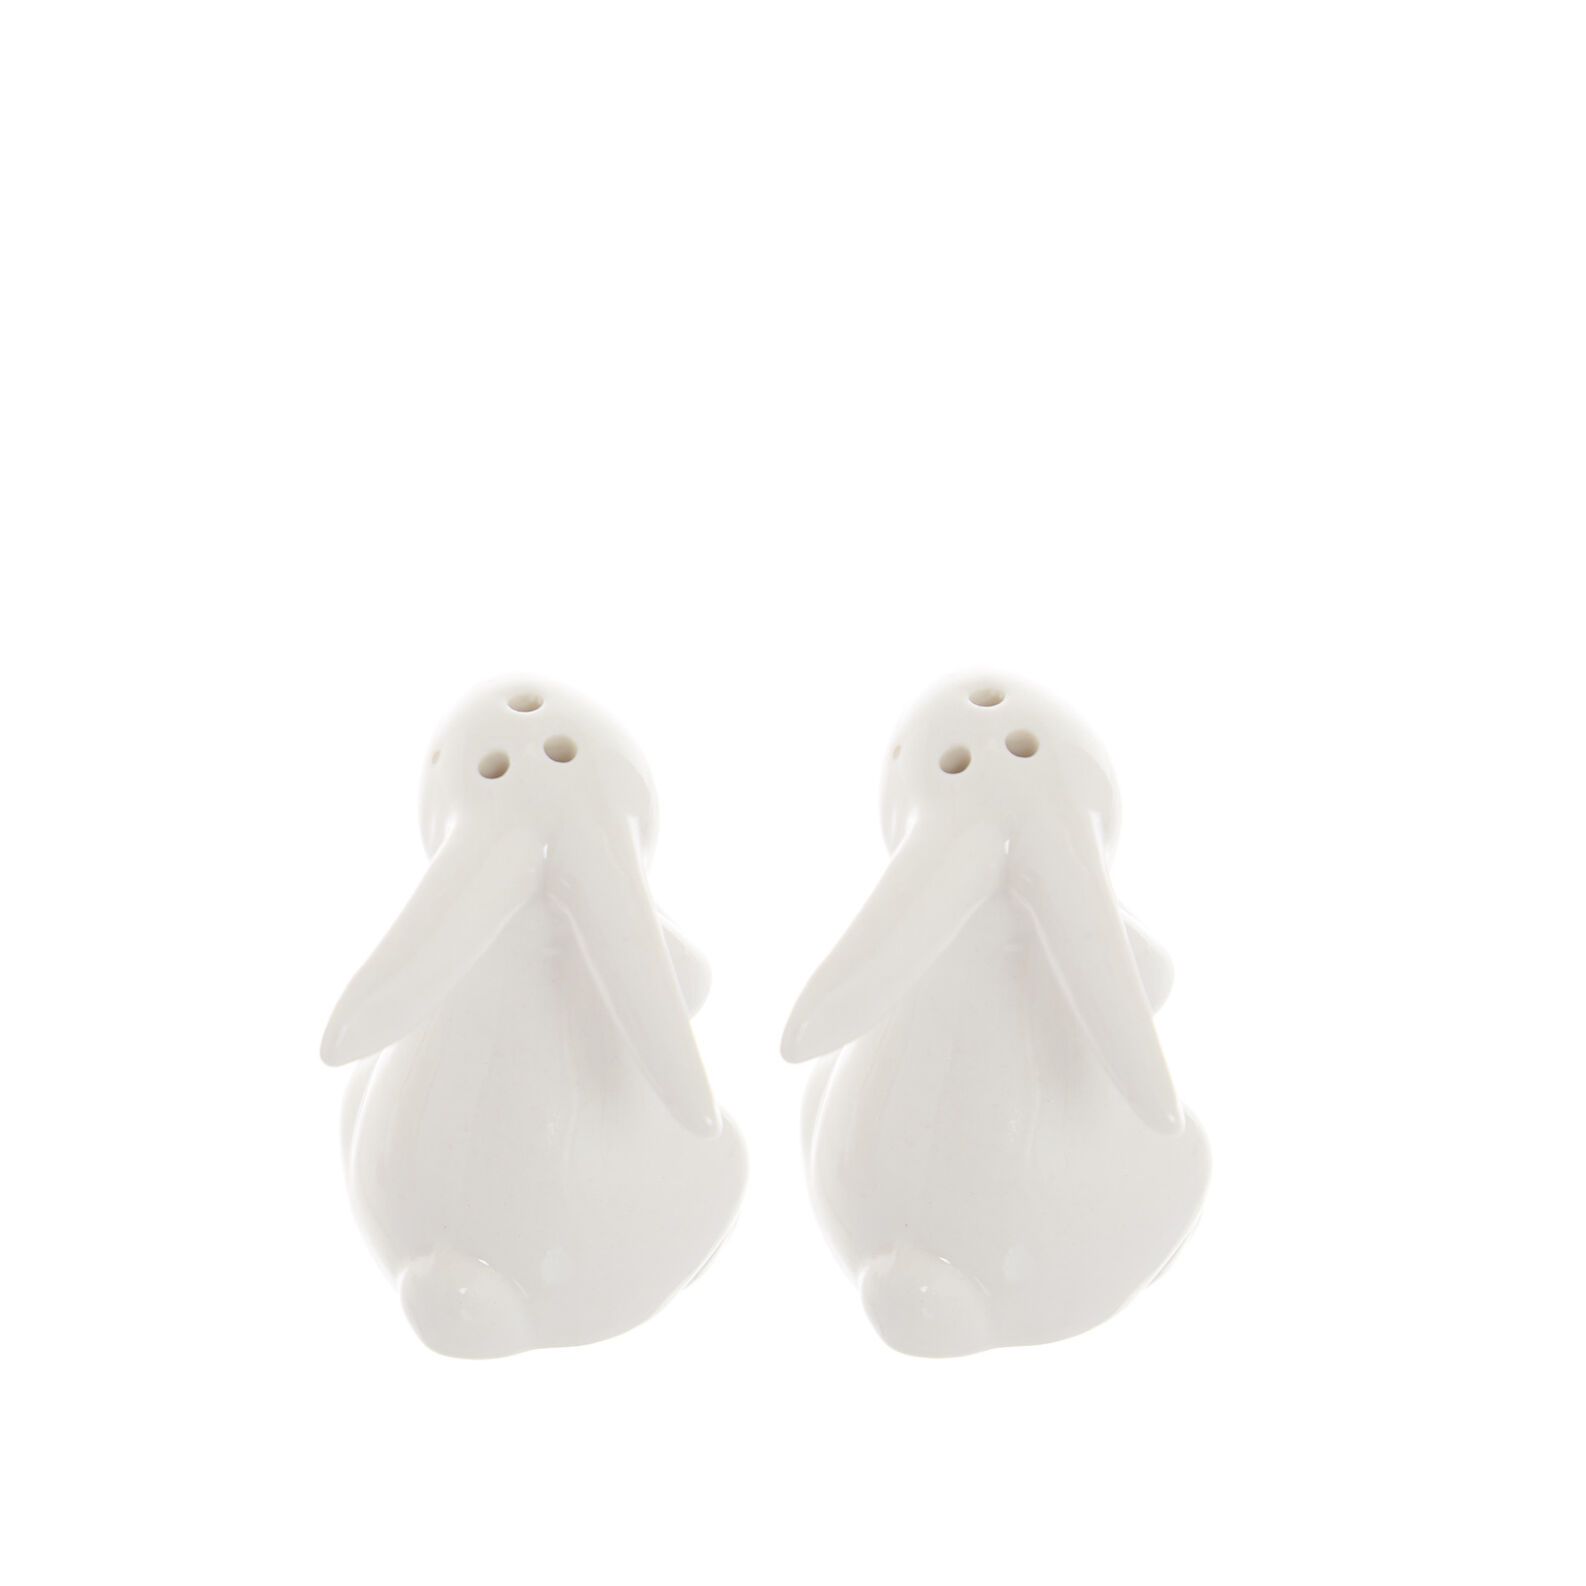 Porcelain rabbit salt and pepper set